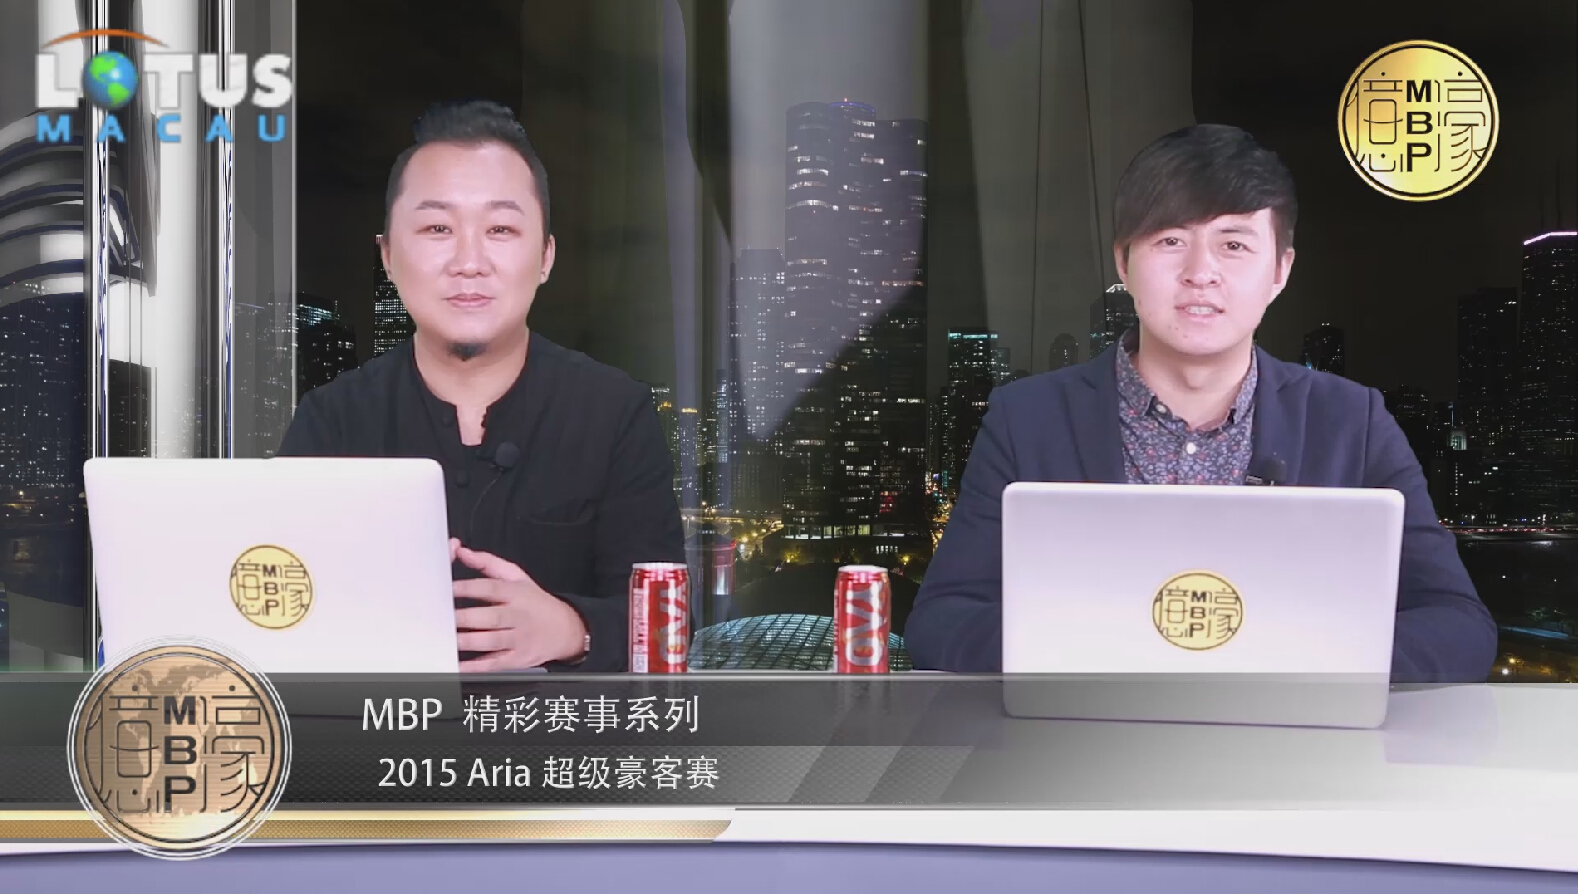 MBP精彩赛事系列第六期【Aria超级豪客赛】网络独家